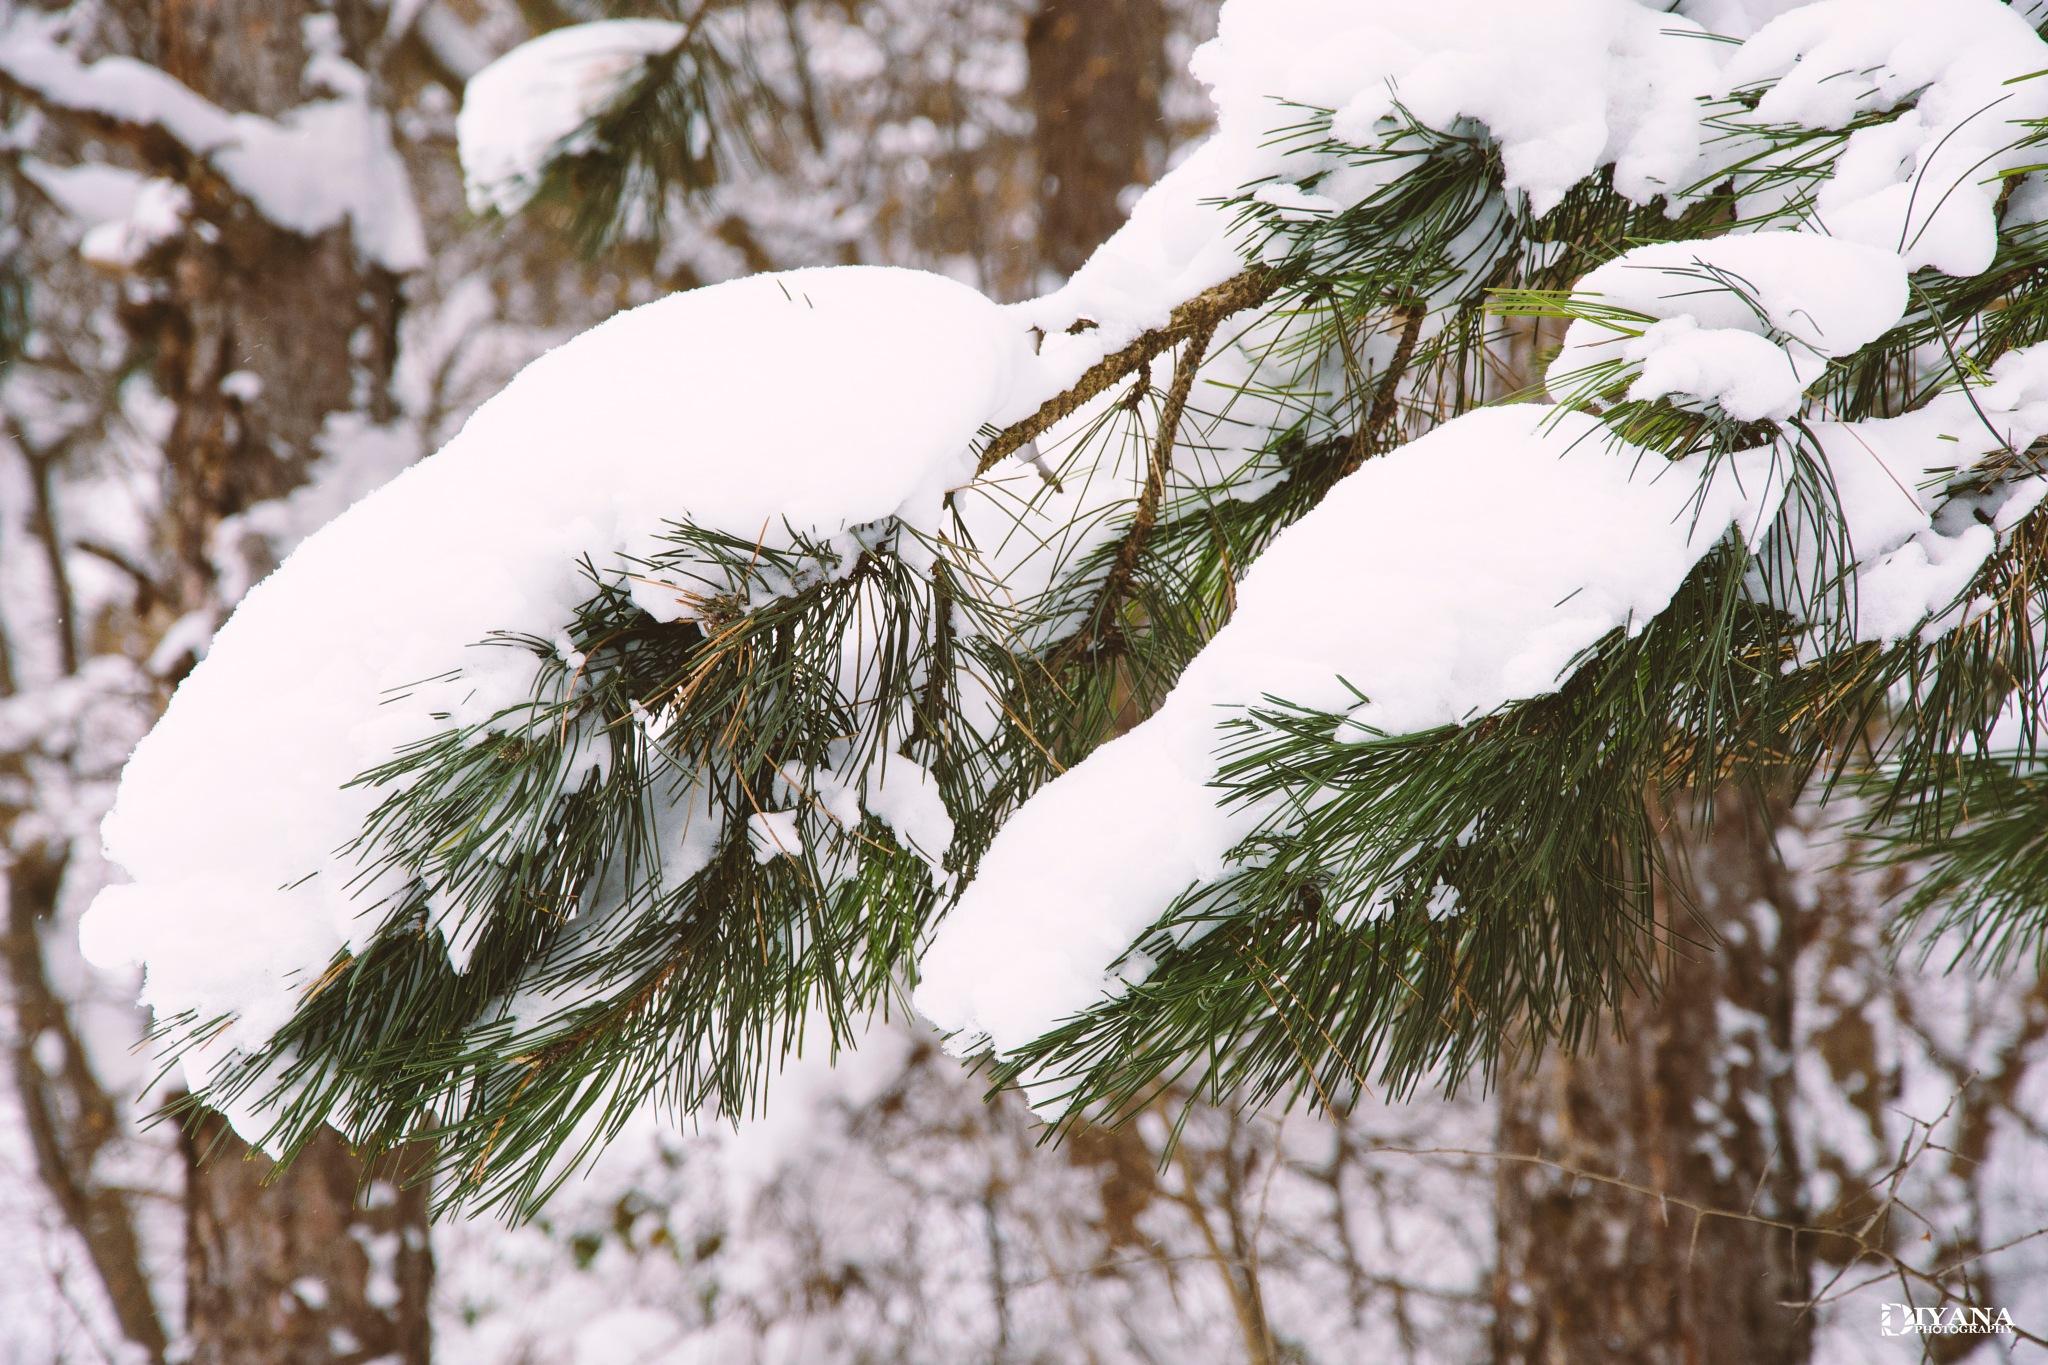 Pine needles by Diyana Ivaylova